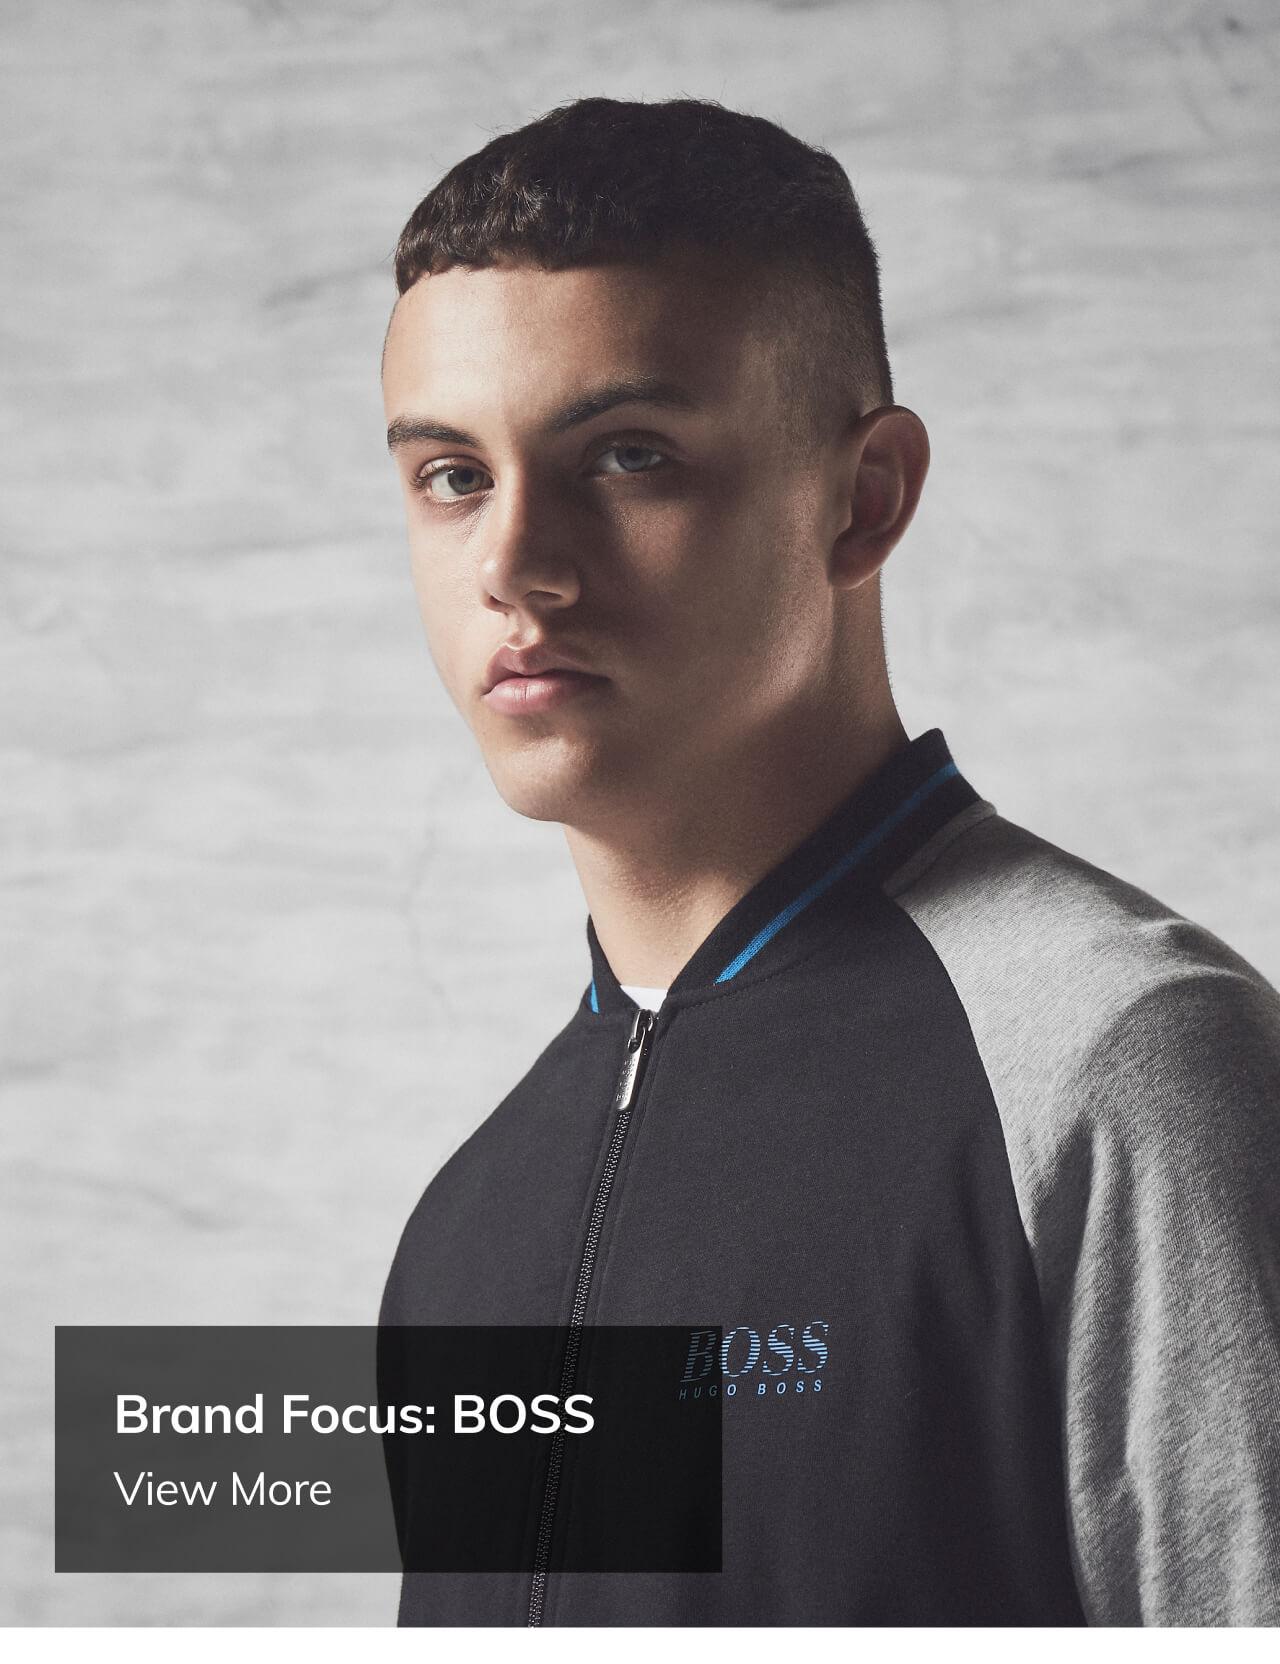 Brand Focus: BOSS